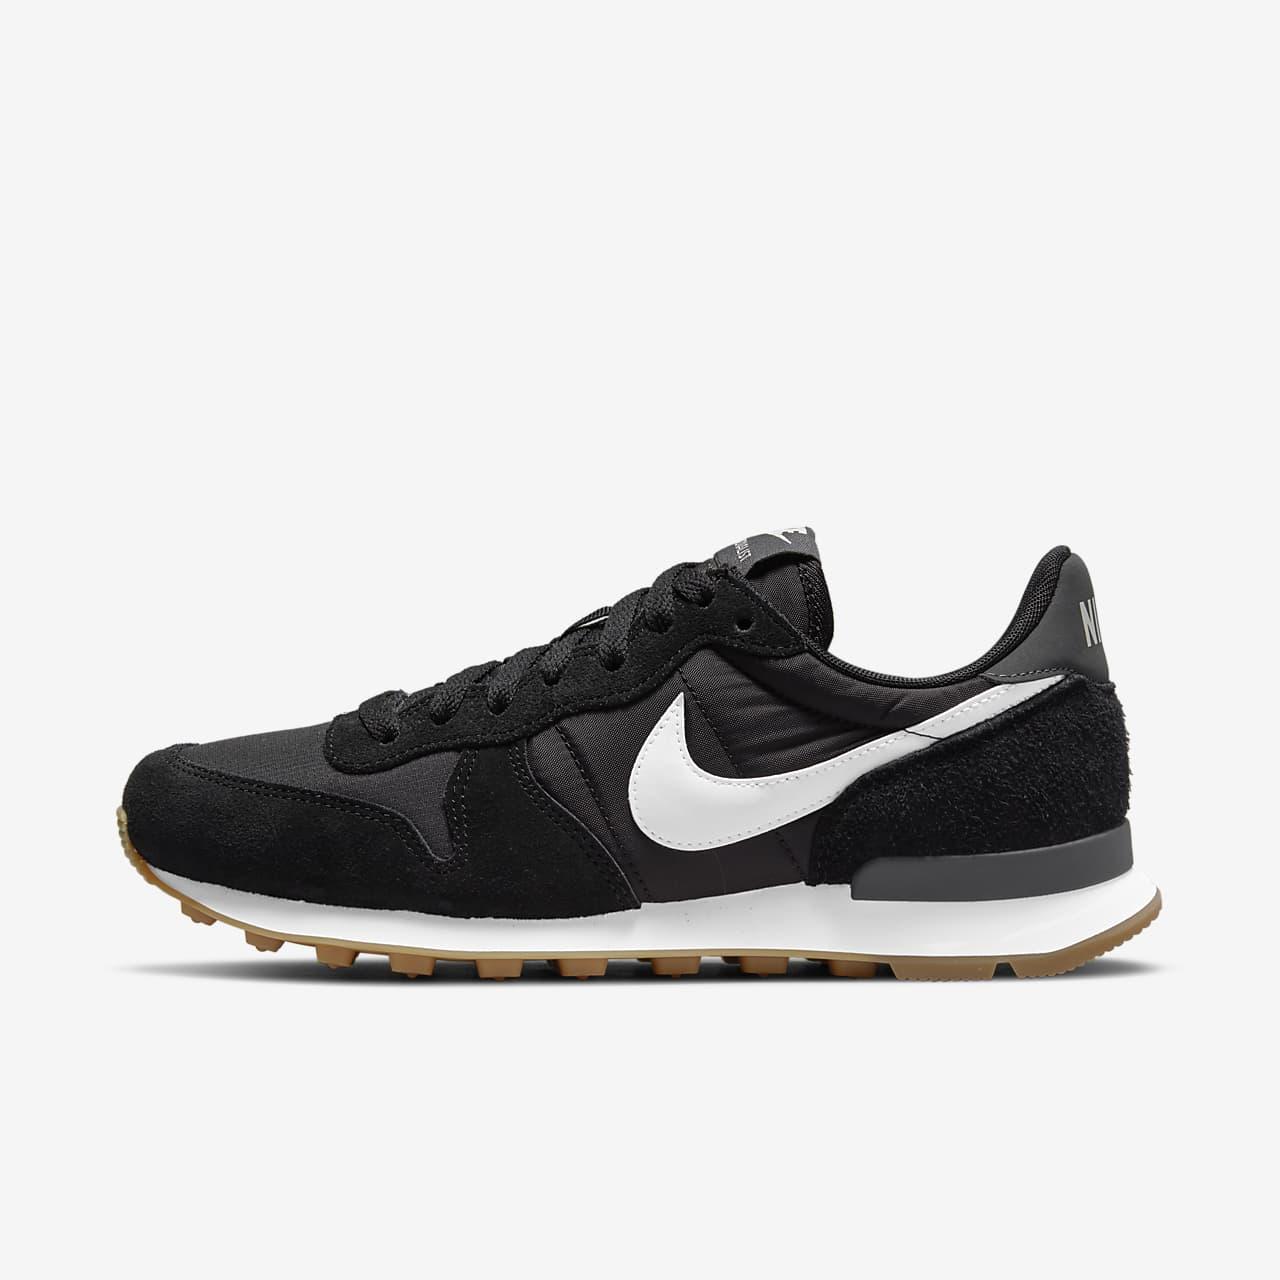 quality design fe334 178e3 low price nike internationalist heat sneakers b197e bf885  shop nike  internationalist womens shoe 2cf7a 9346a